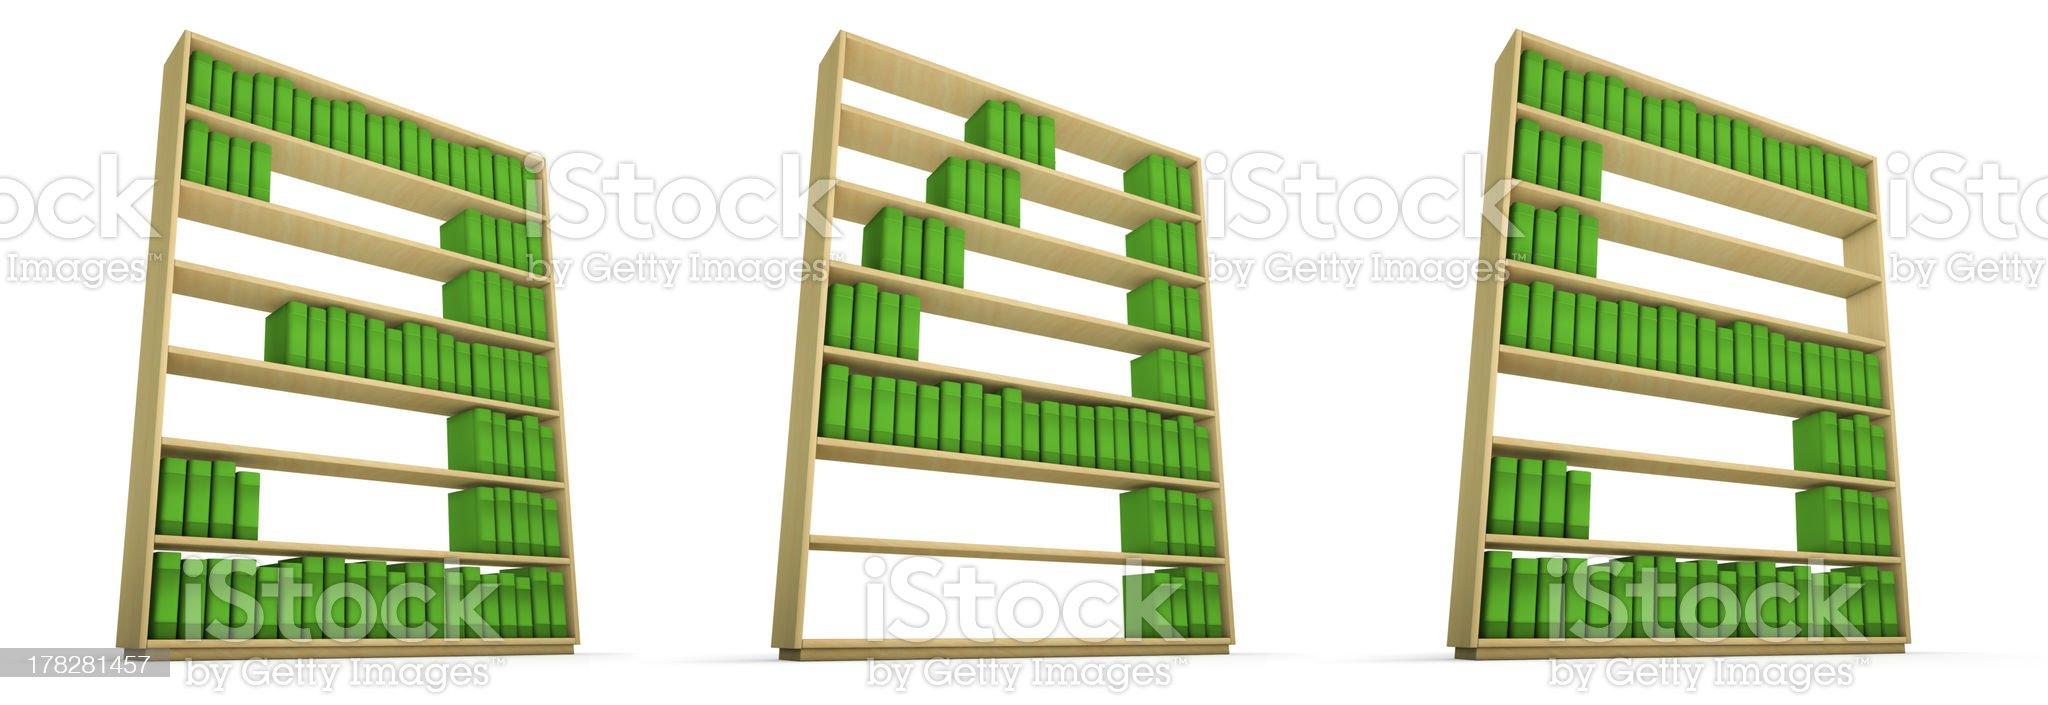 Bookcase alphabet royalty-free stock photo